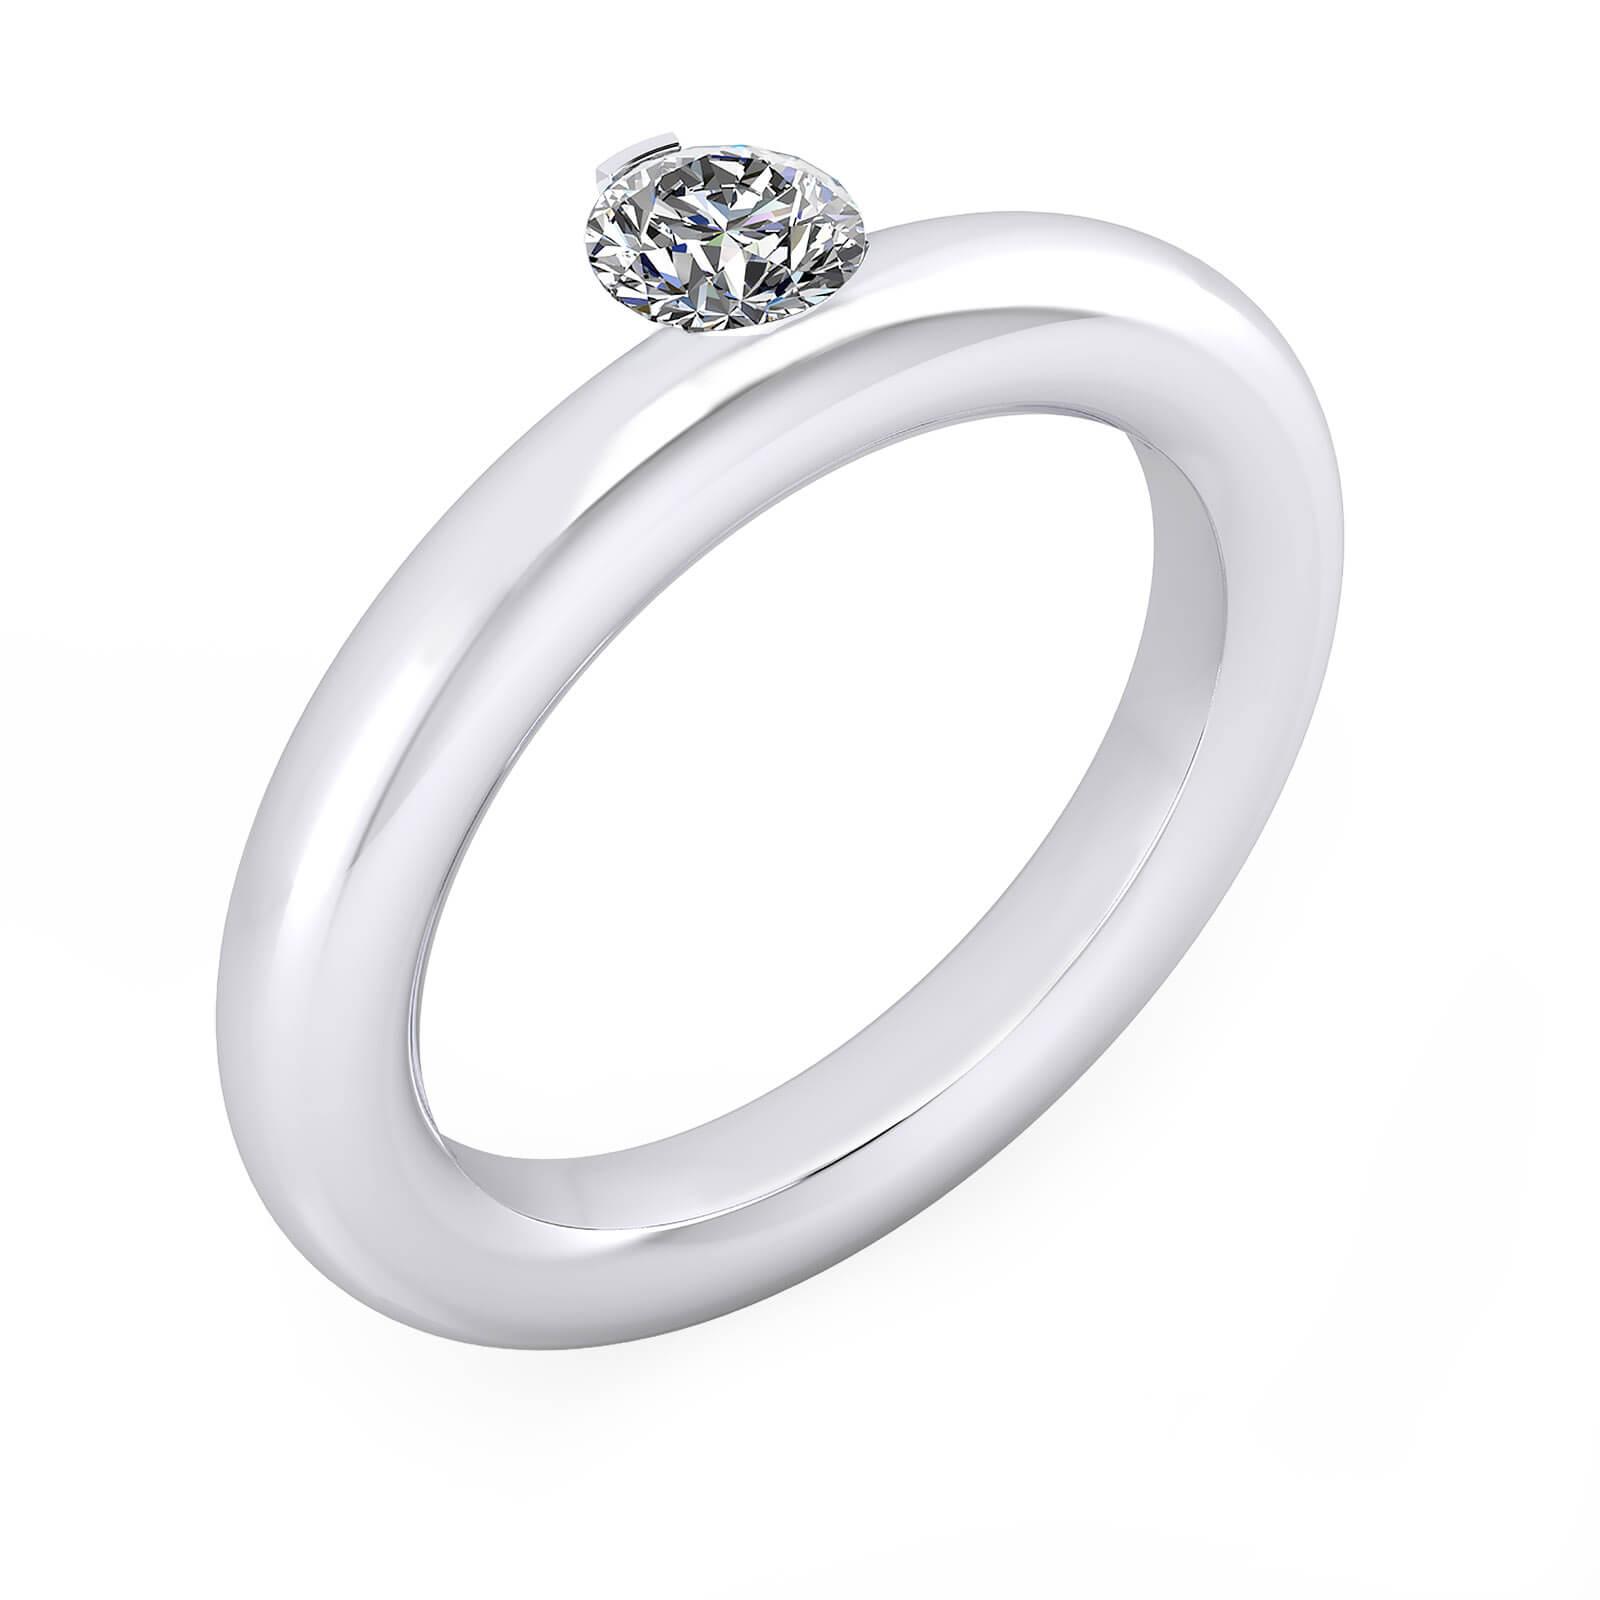 Fotos de anillos de compromiso en oro 36